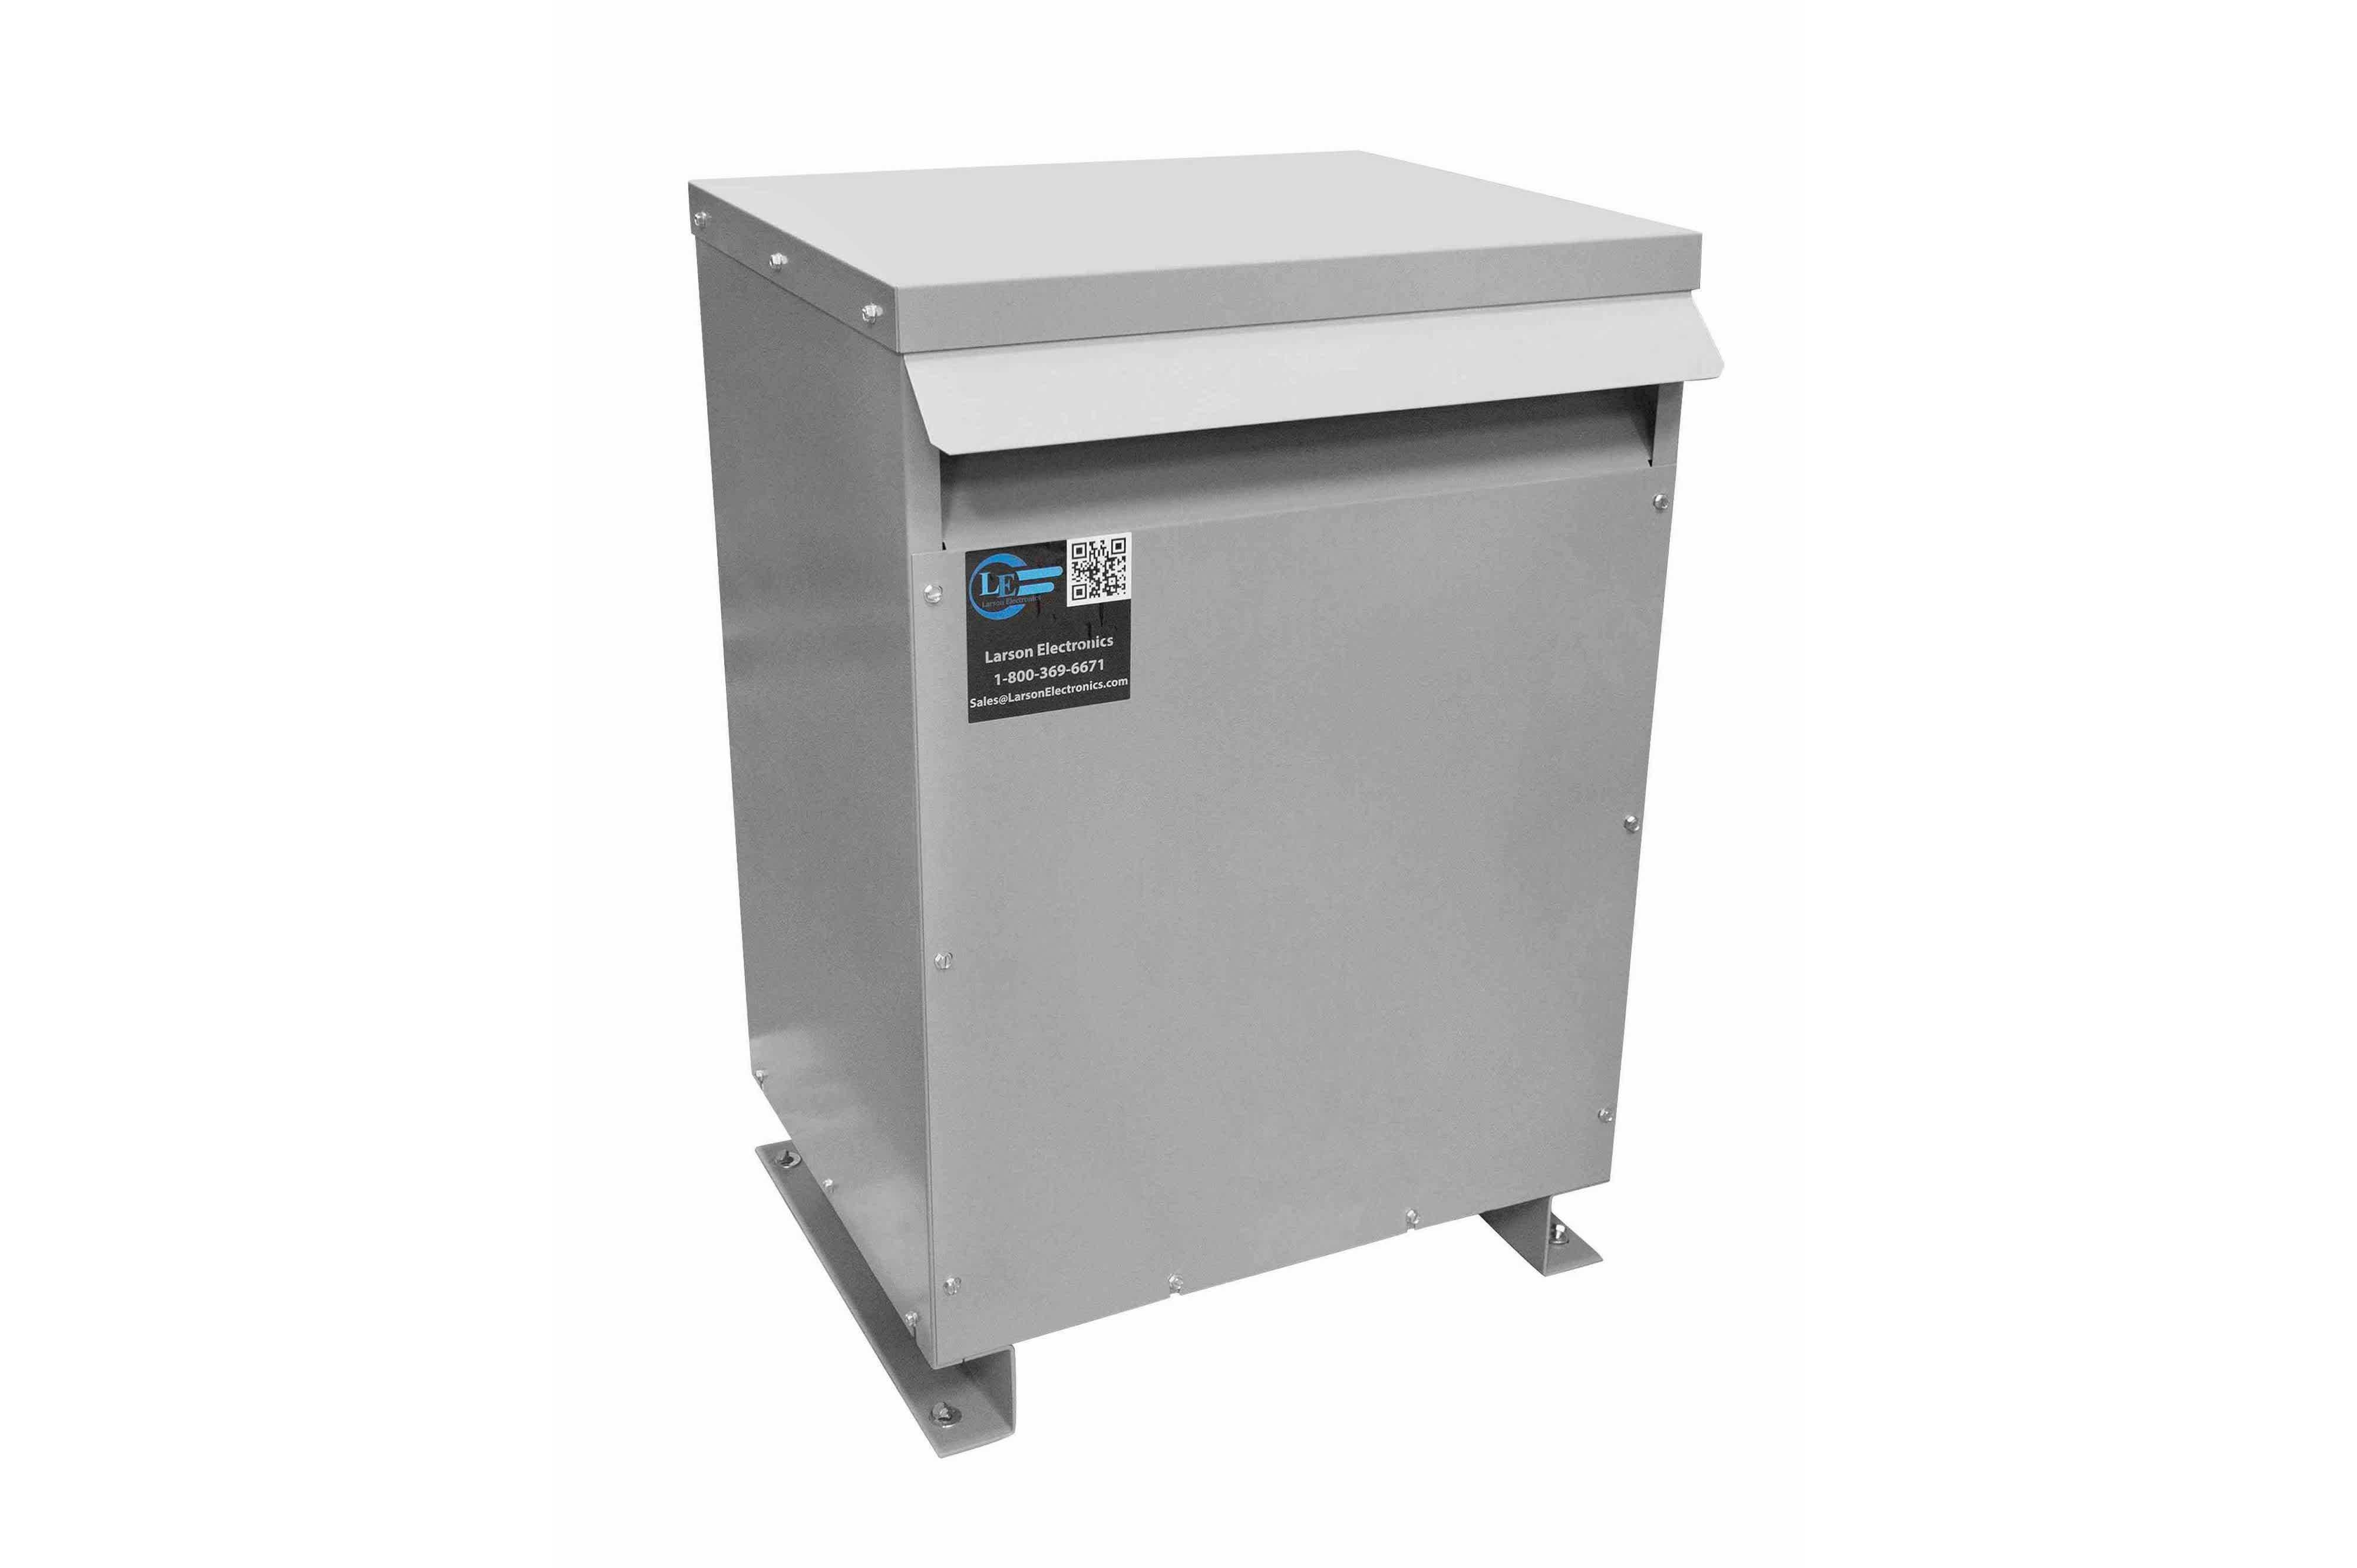 112.5 kVA 3PH Isolation Transformer, 460V Wye Primary, 415V Delta Secondary, N3R, Ventilated, 60 Hz